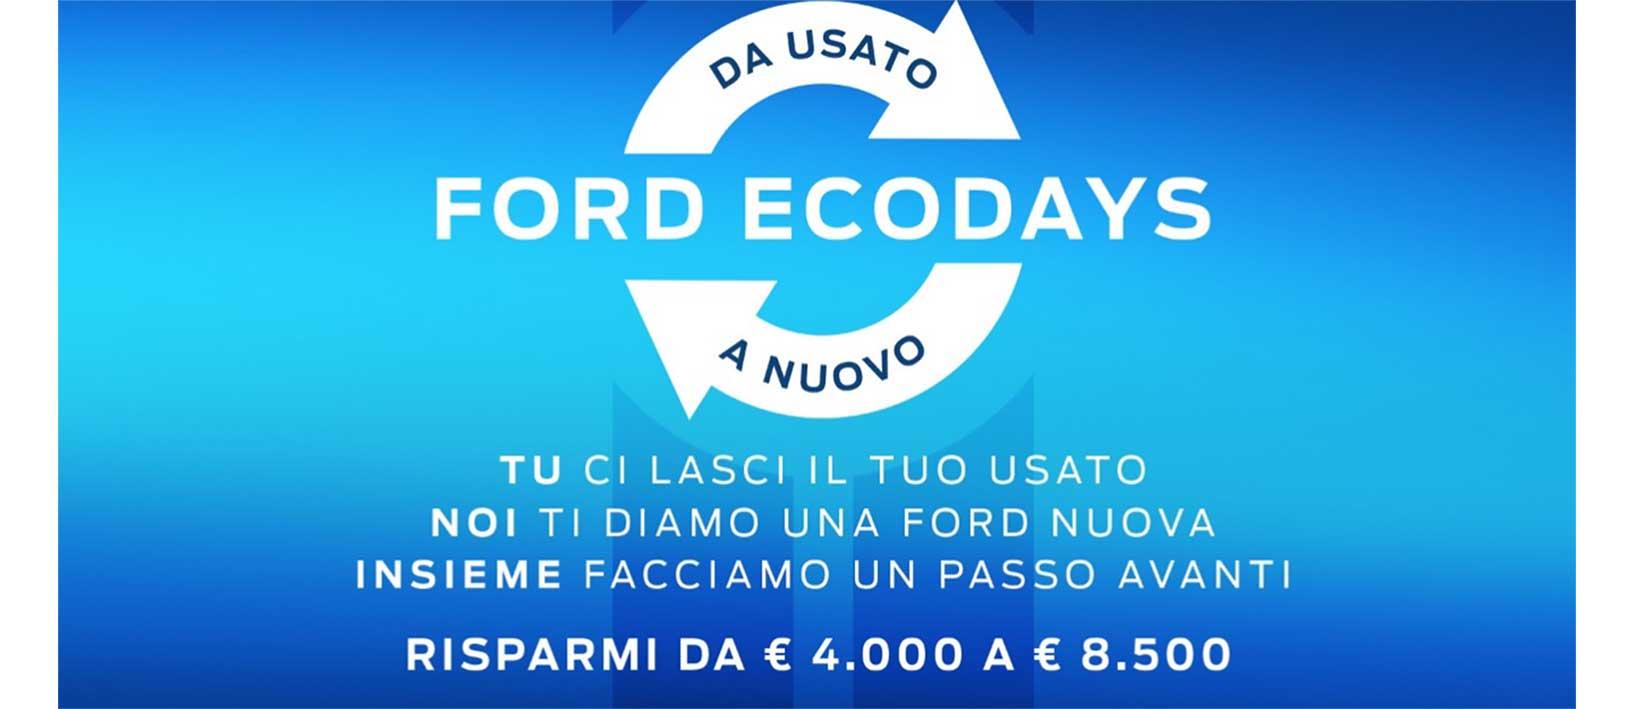 ford ecodays